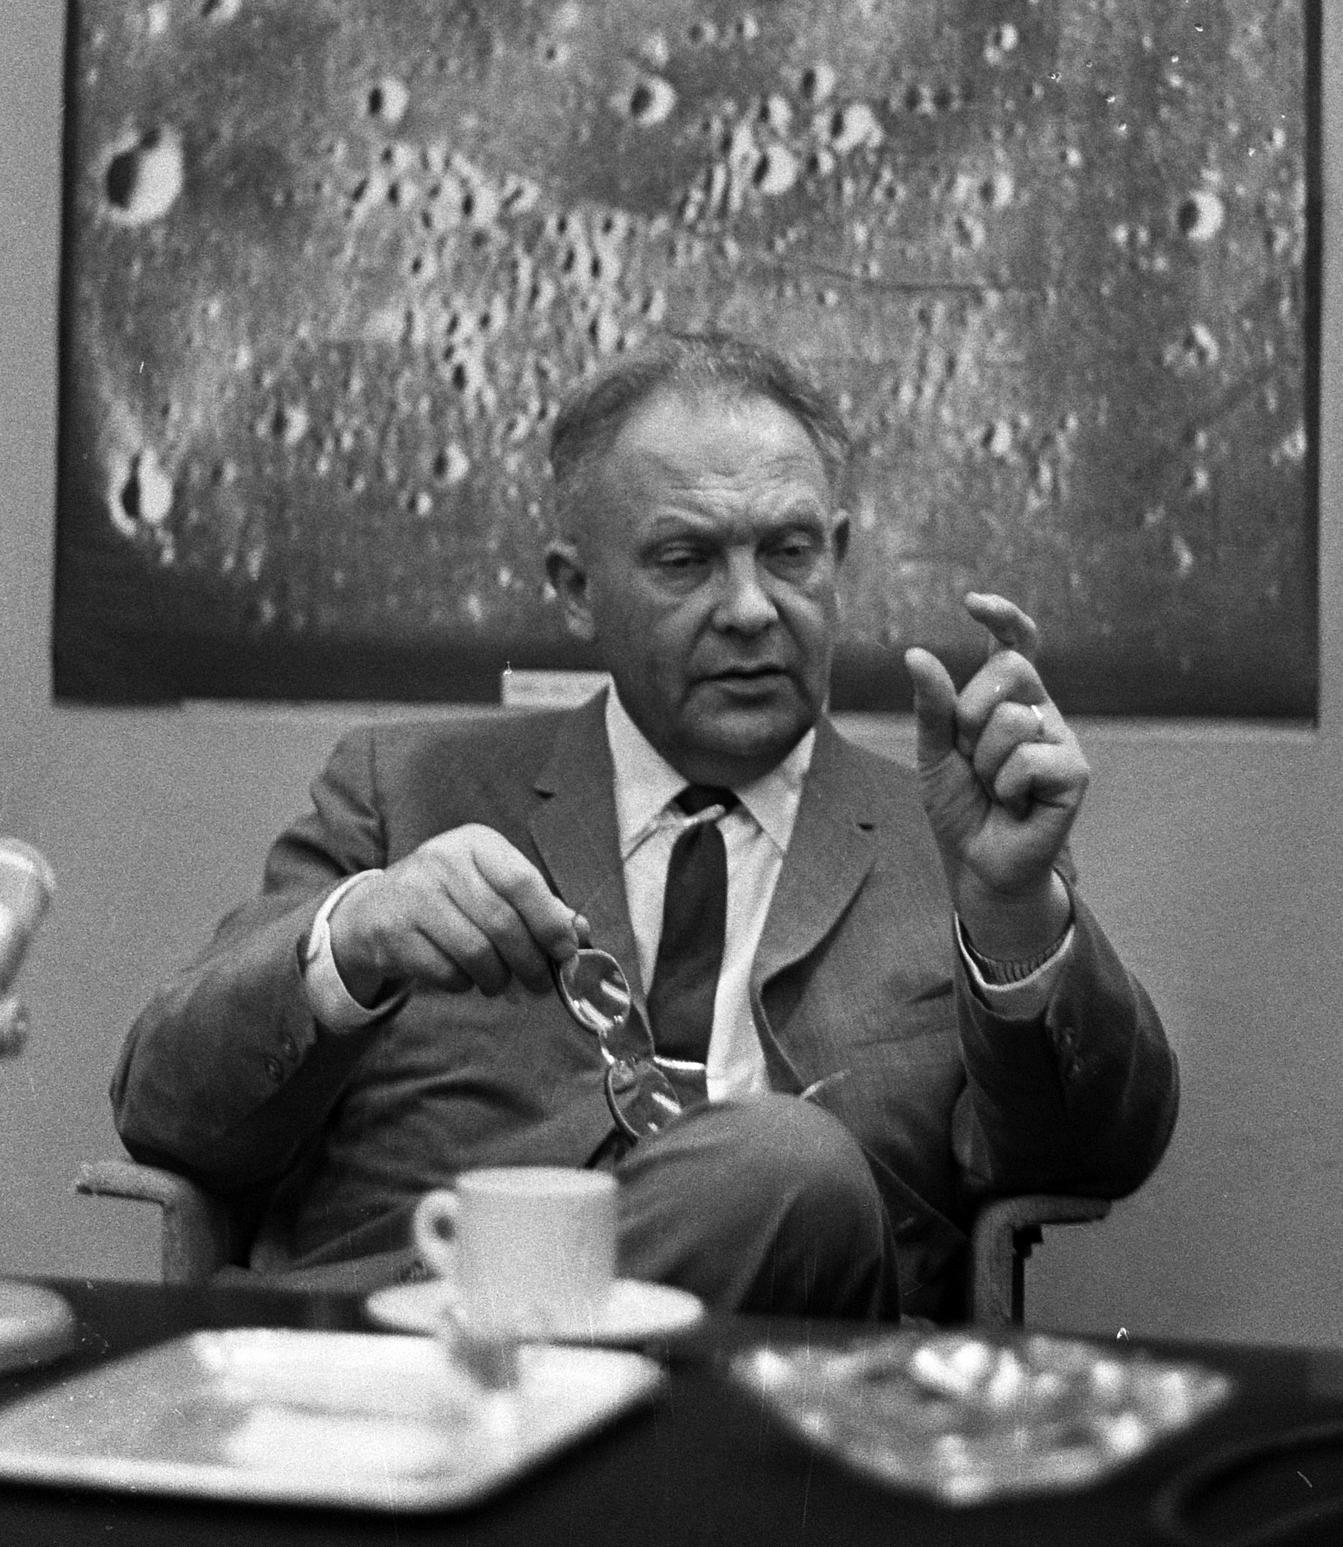 Джерард Койпер (1964). Dutch National Archives